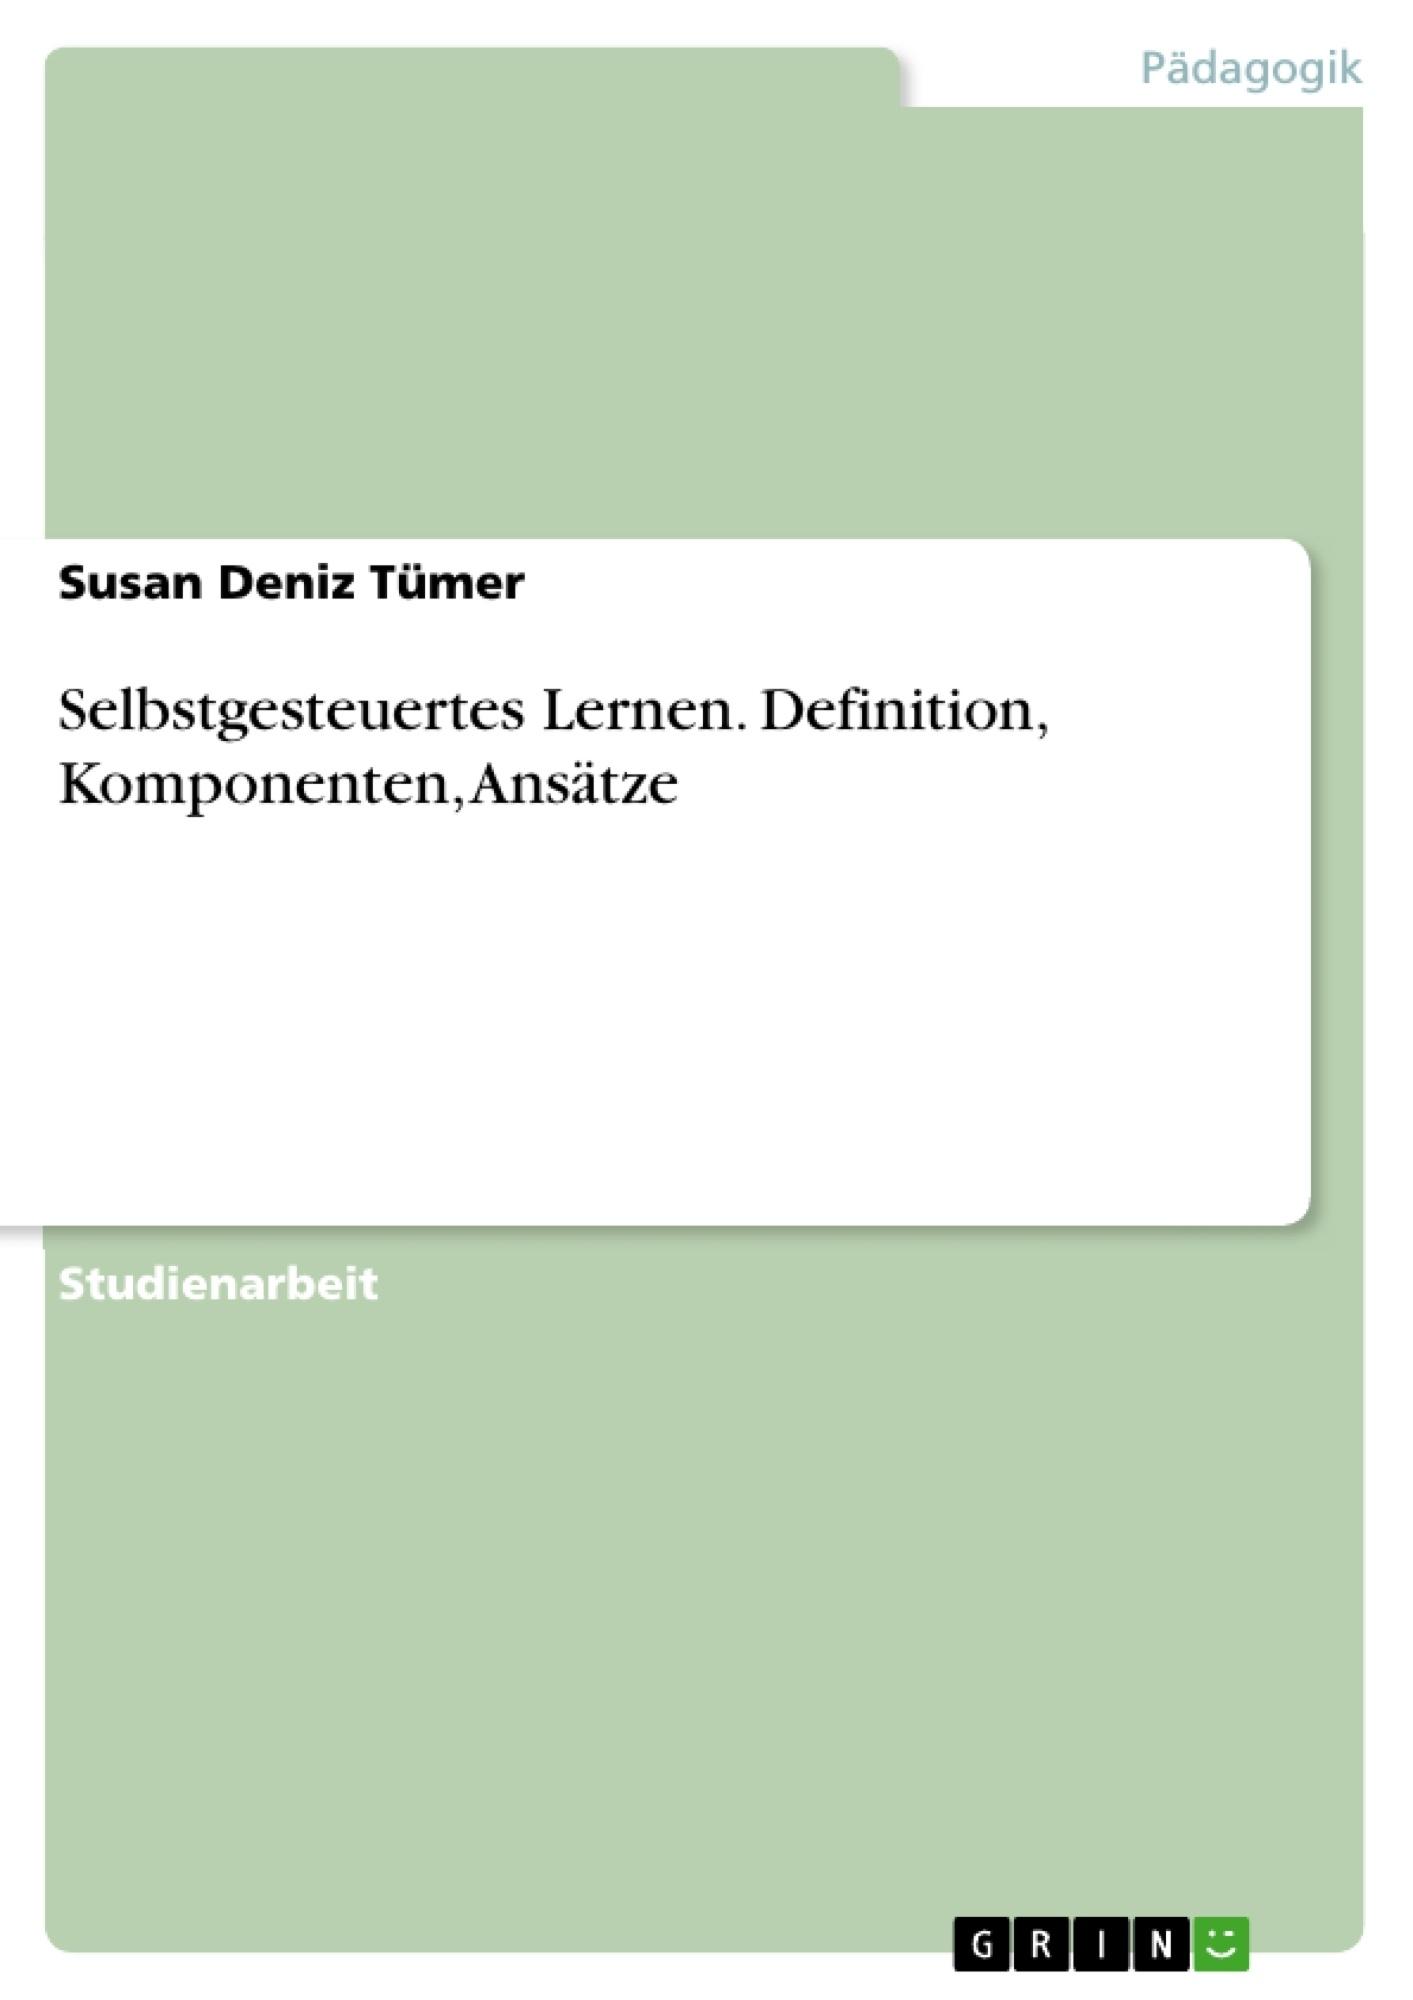 Titel: Selbstgesteuertes Lernen. Definition, Komponenten, Ansätze